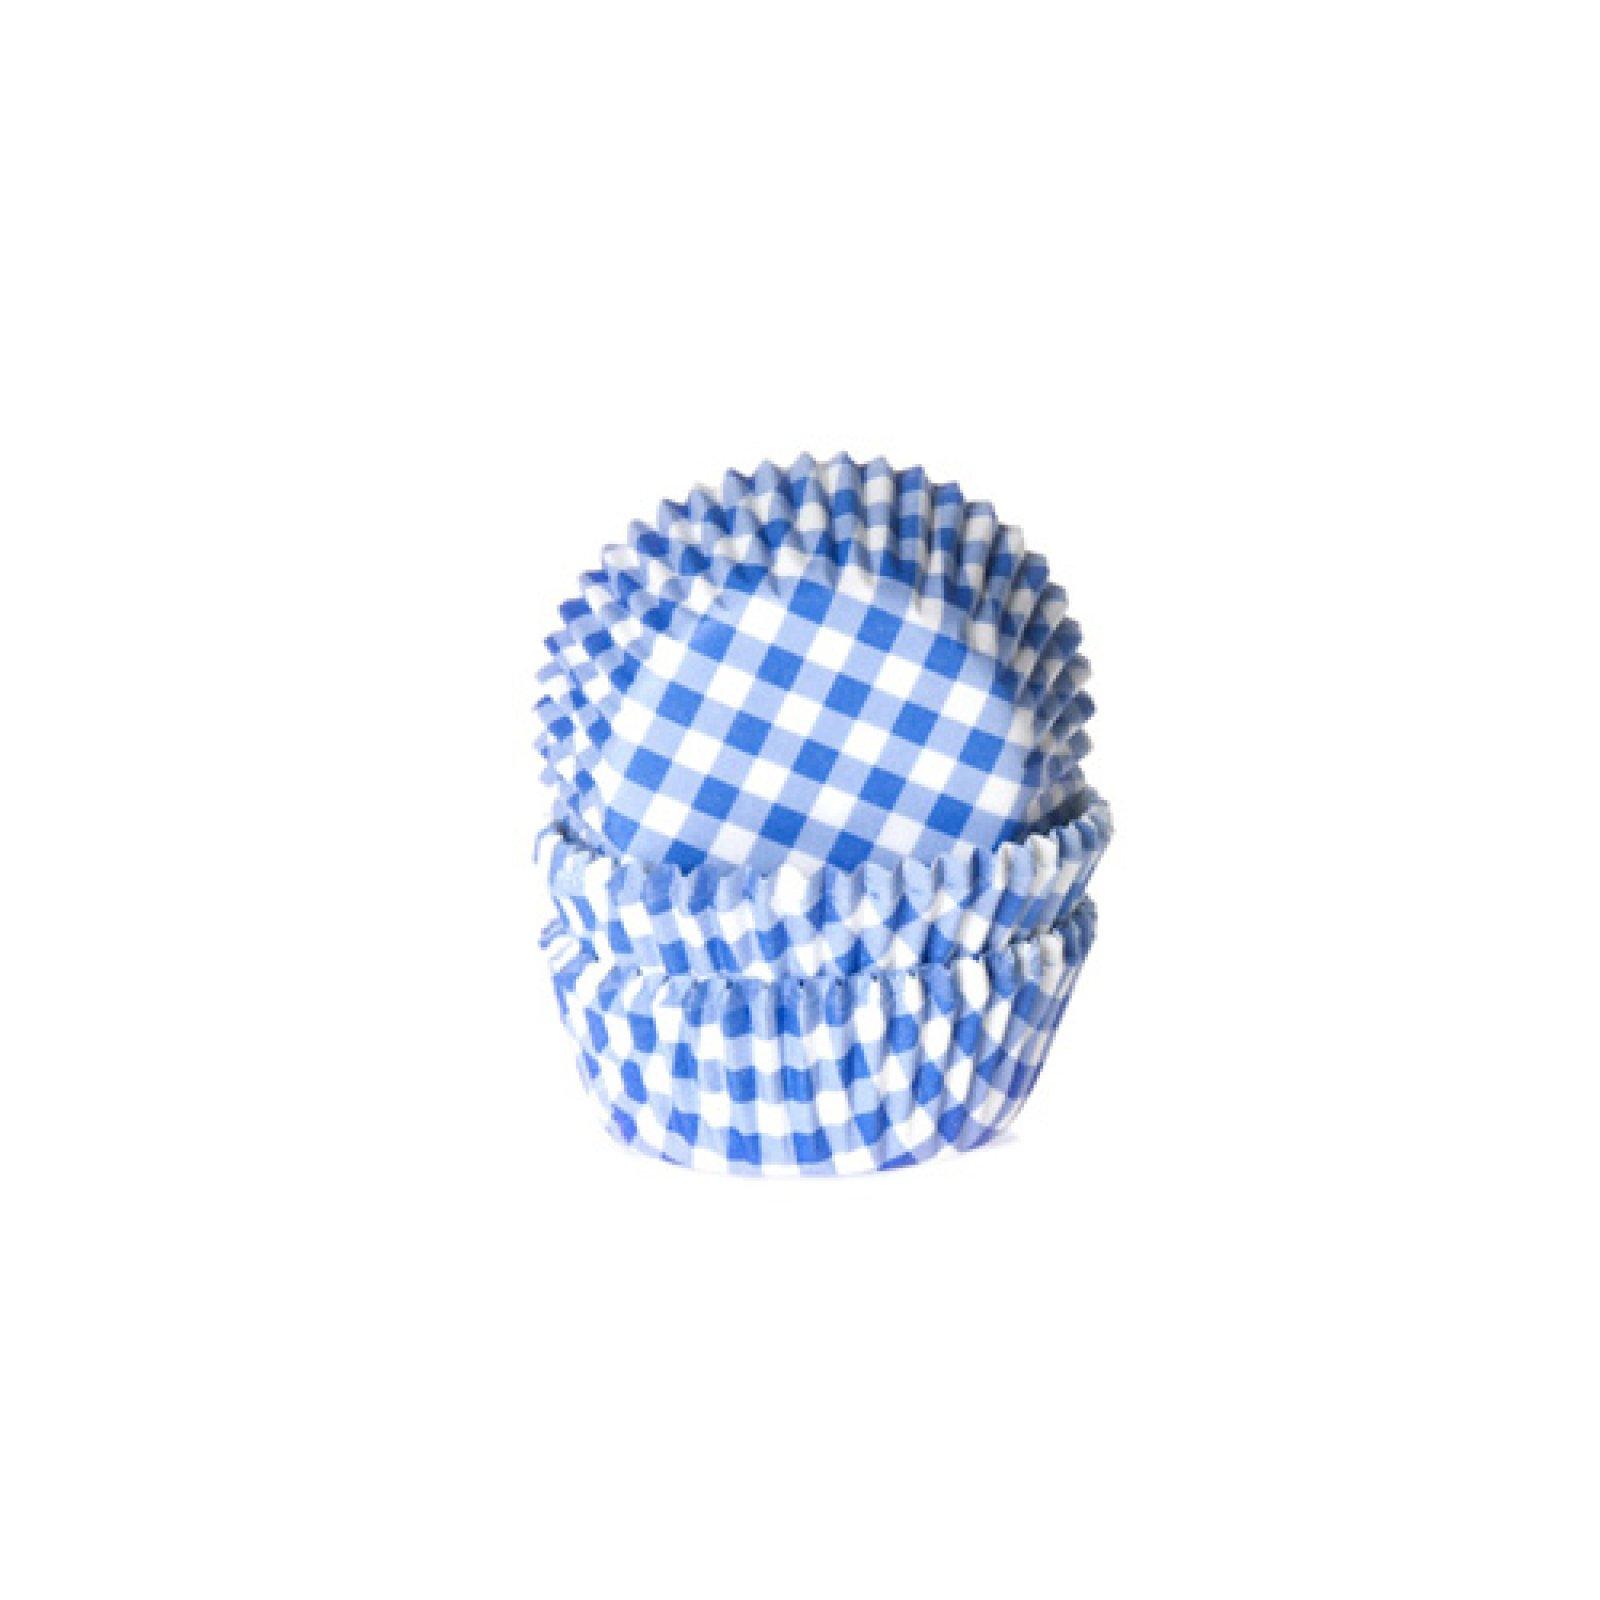 60 mini muffinformen blau kariert der ideen. Black Bedroom Furniture Sets. Home Design Ideas